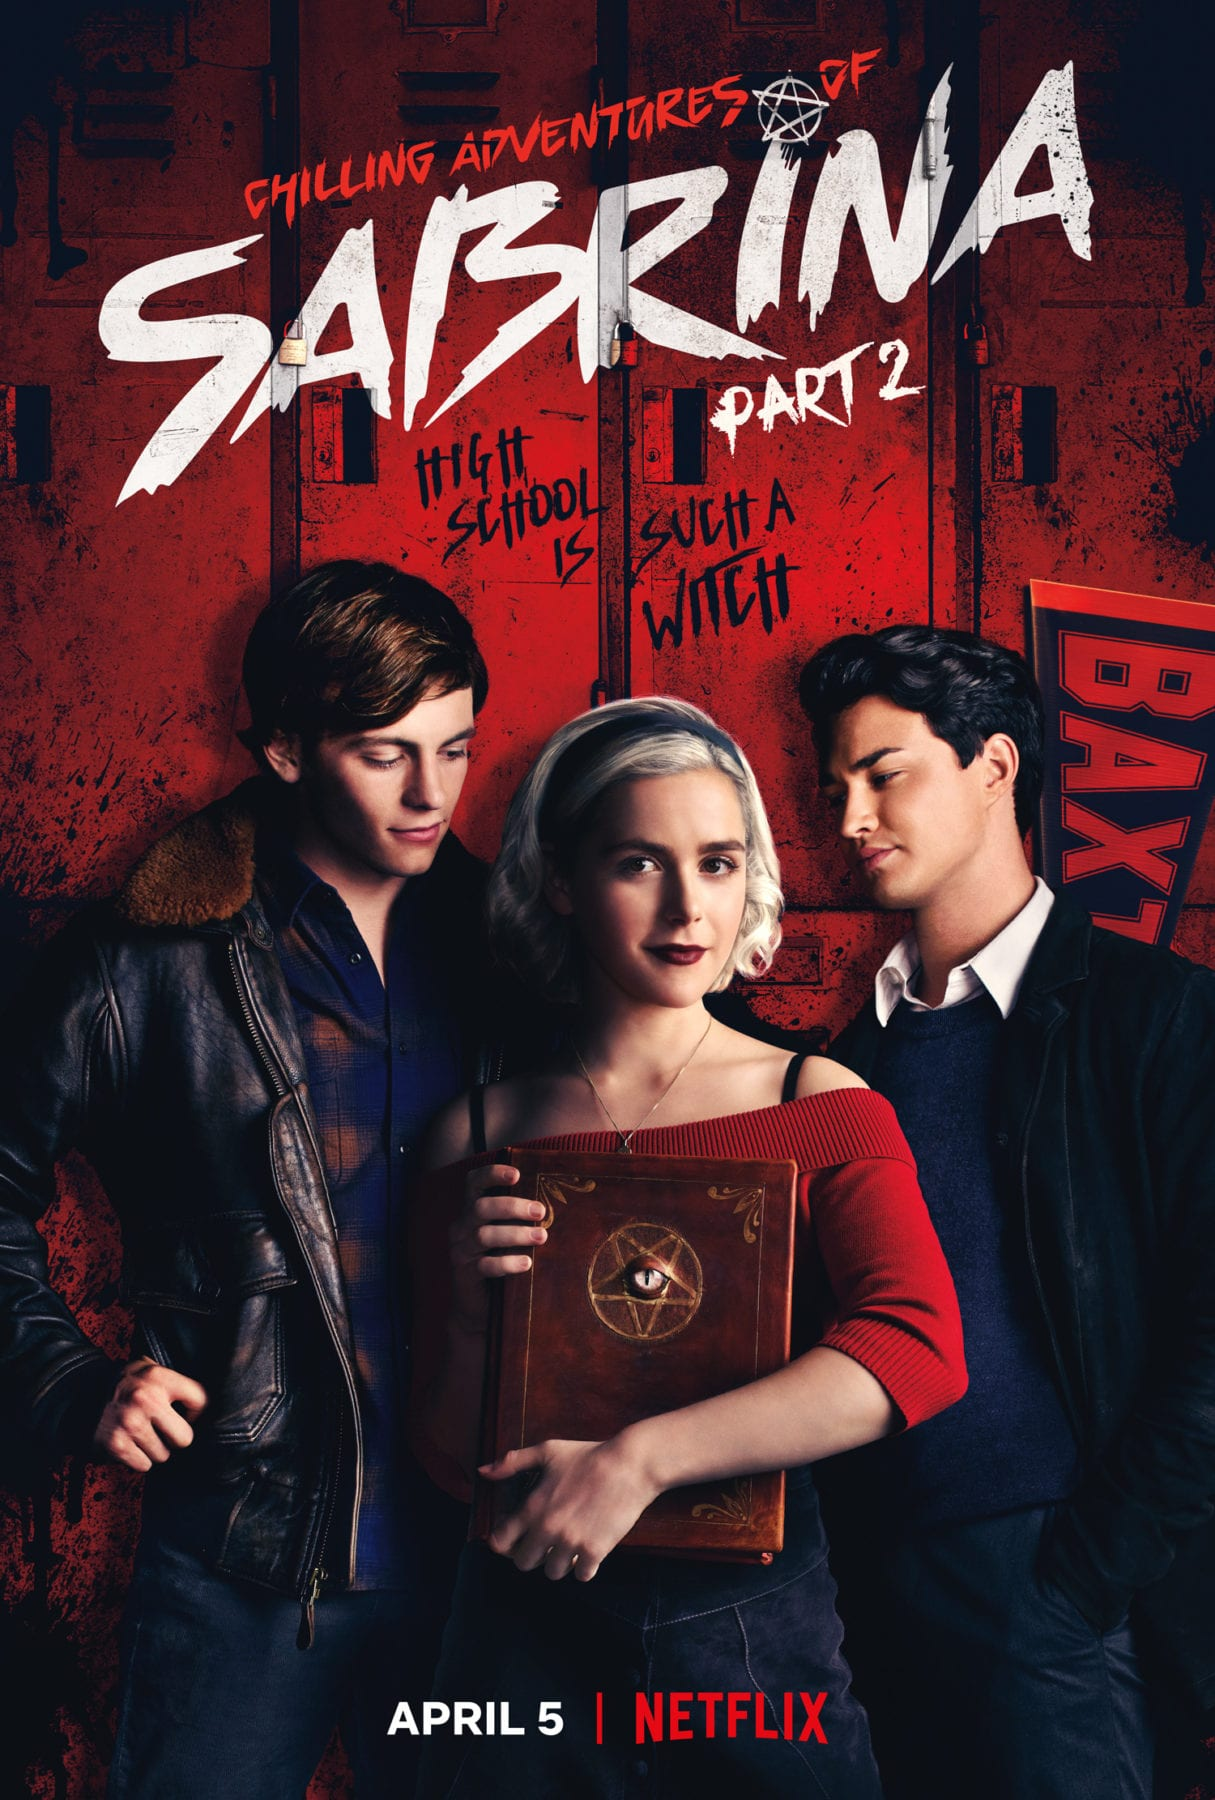 Netflix Releases Chilling Adventures Of Sabrina Season 2